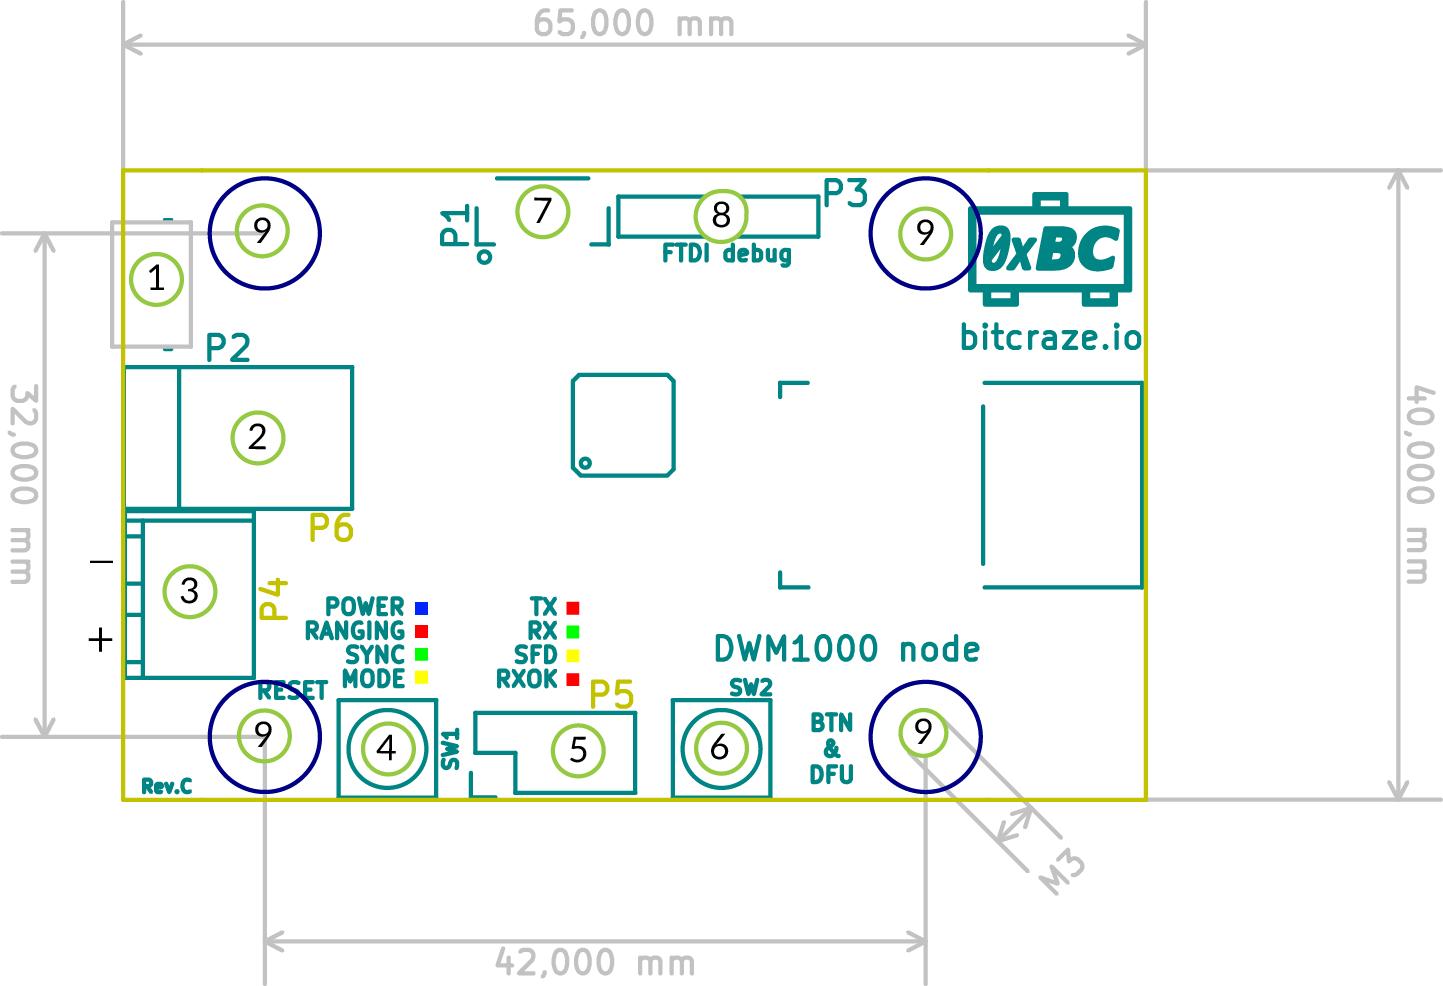 Projectslpsnode Bitcraze Wiki Ftdi Cable Schematic Lps Node